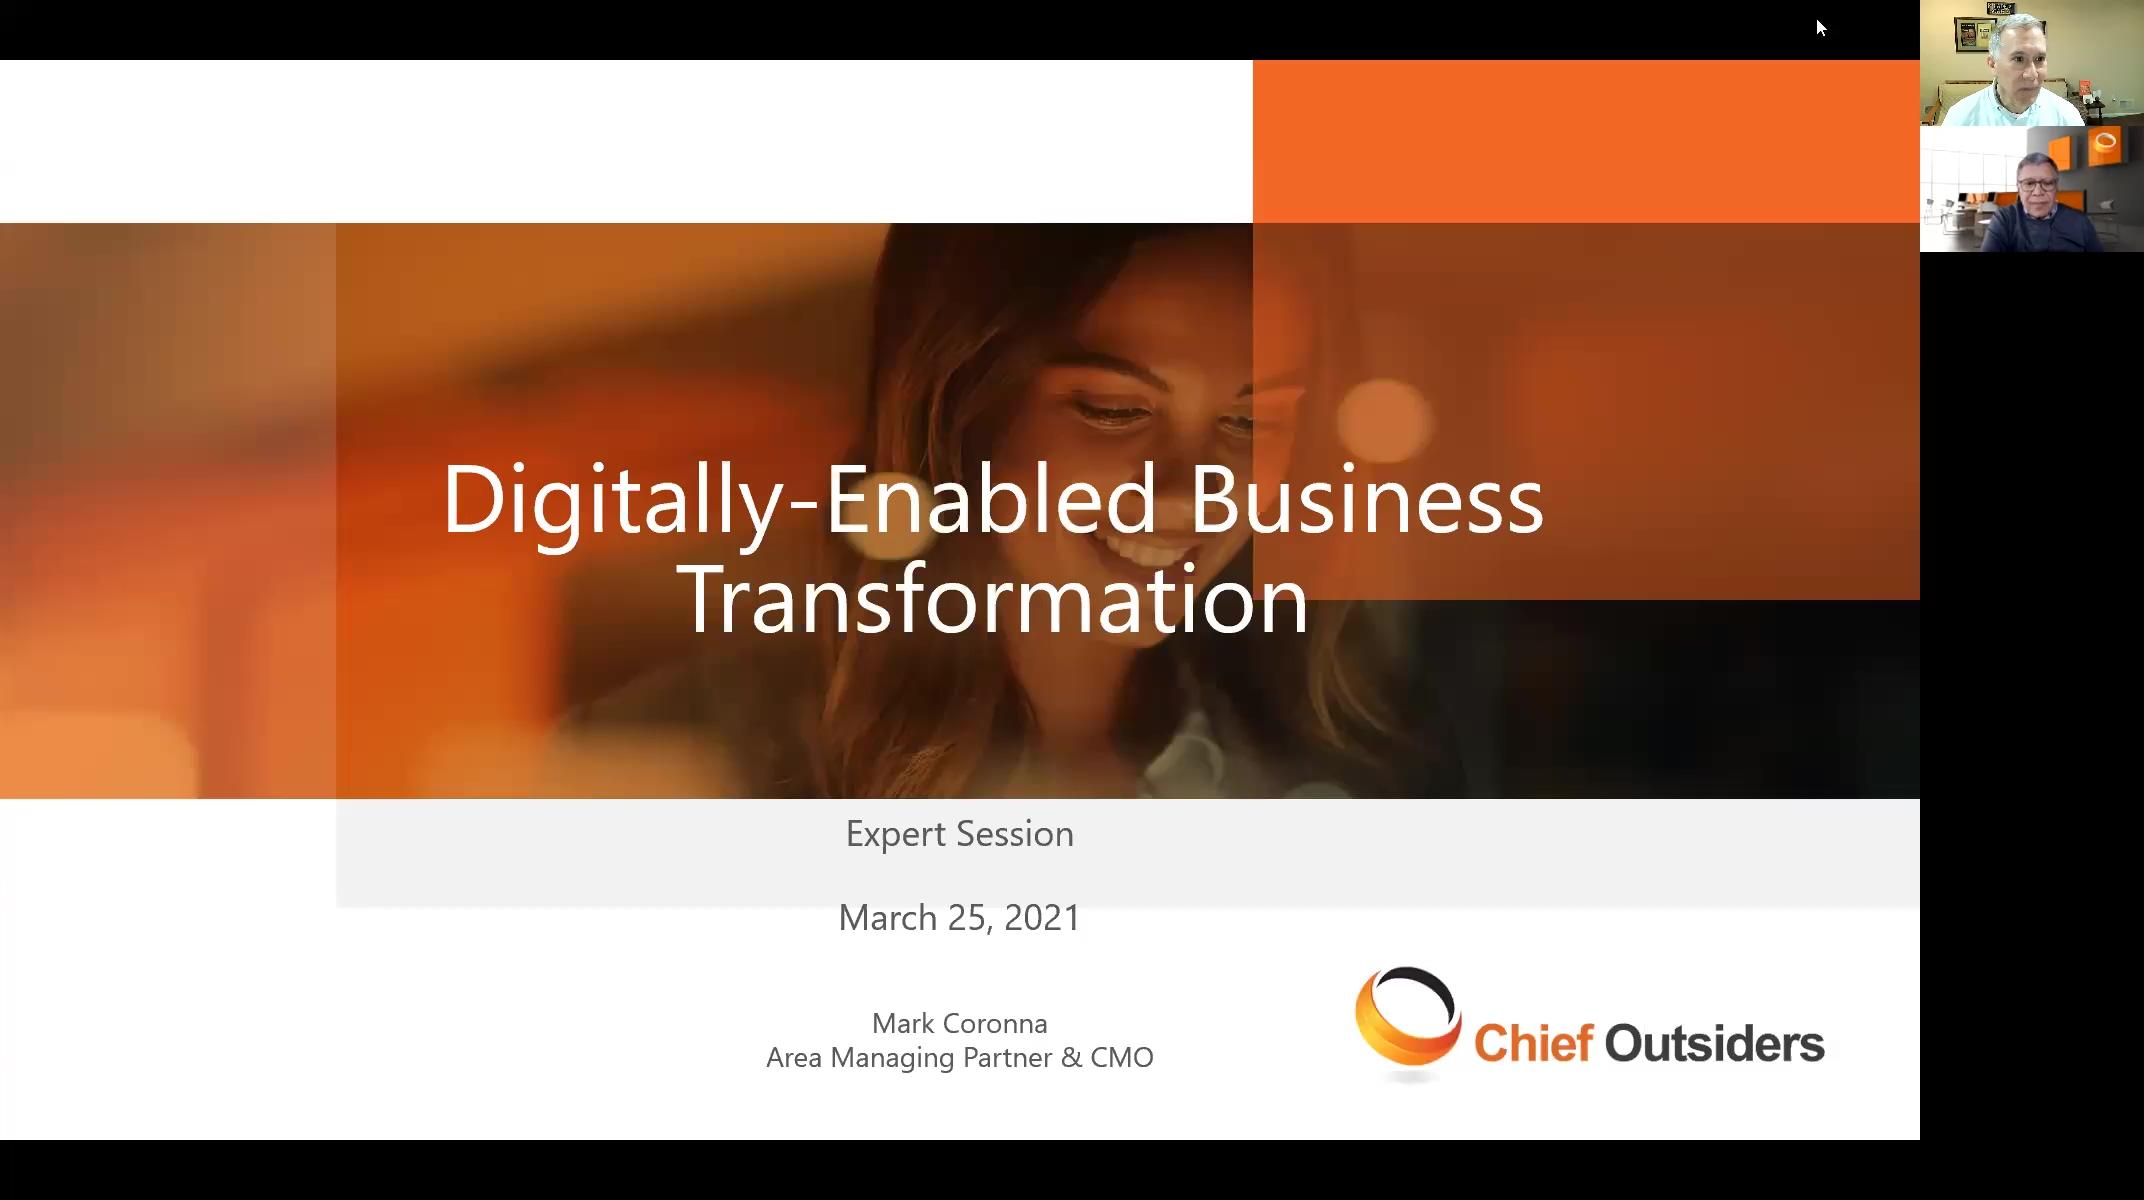 digitally-enabled-business-transformation-webinar